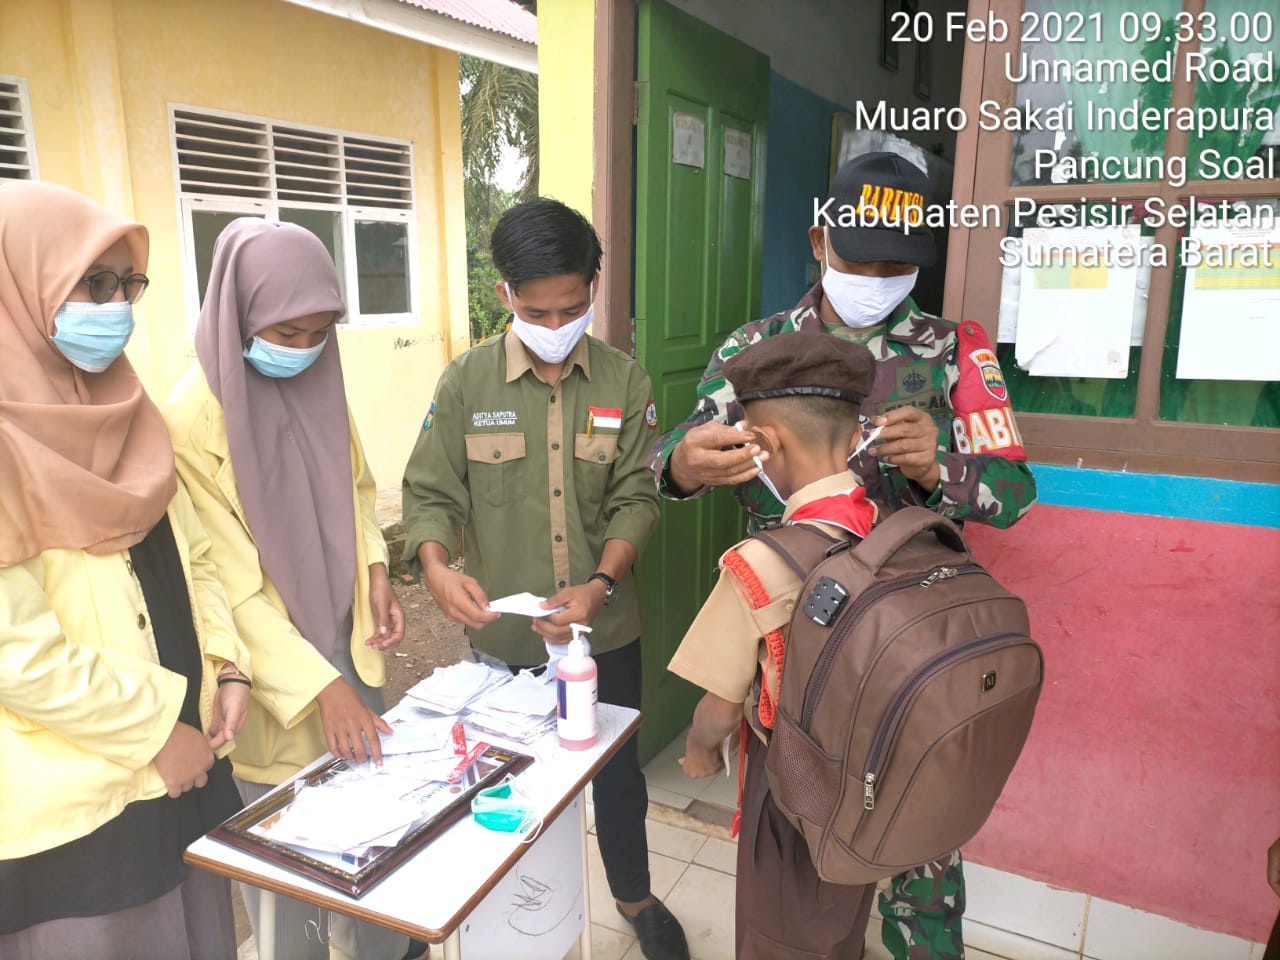 Bersama Himanpura Babinsa Koramil 01/Pessel Sosialisasikan Prokes